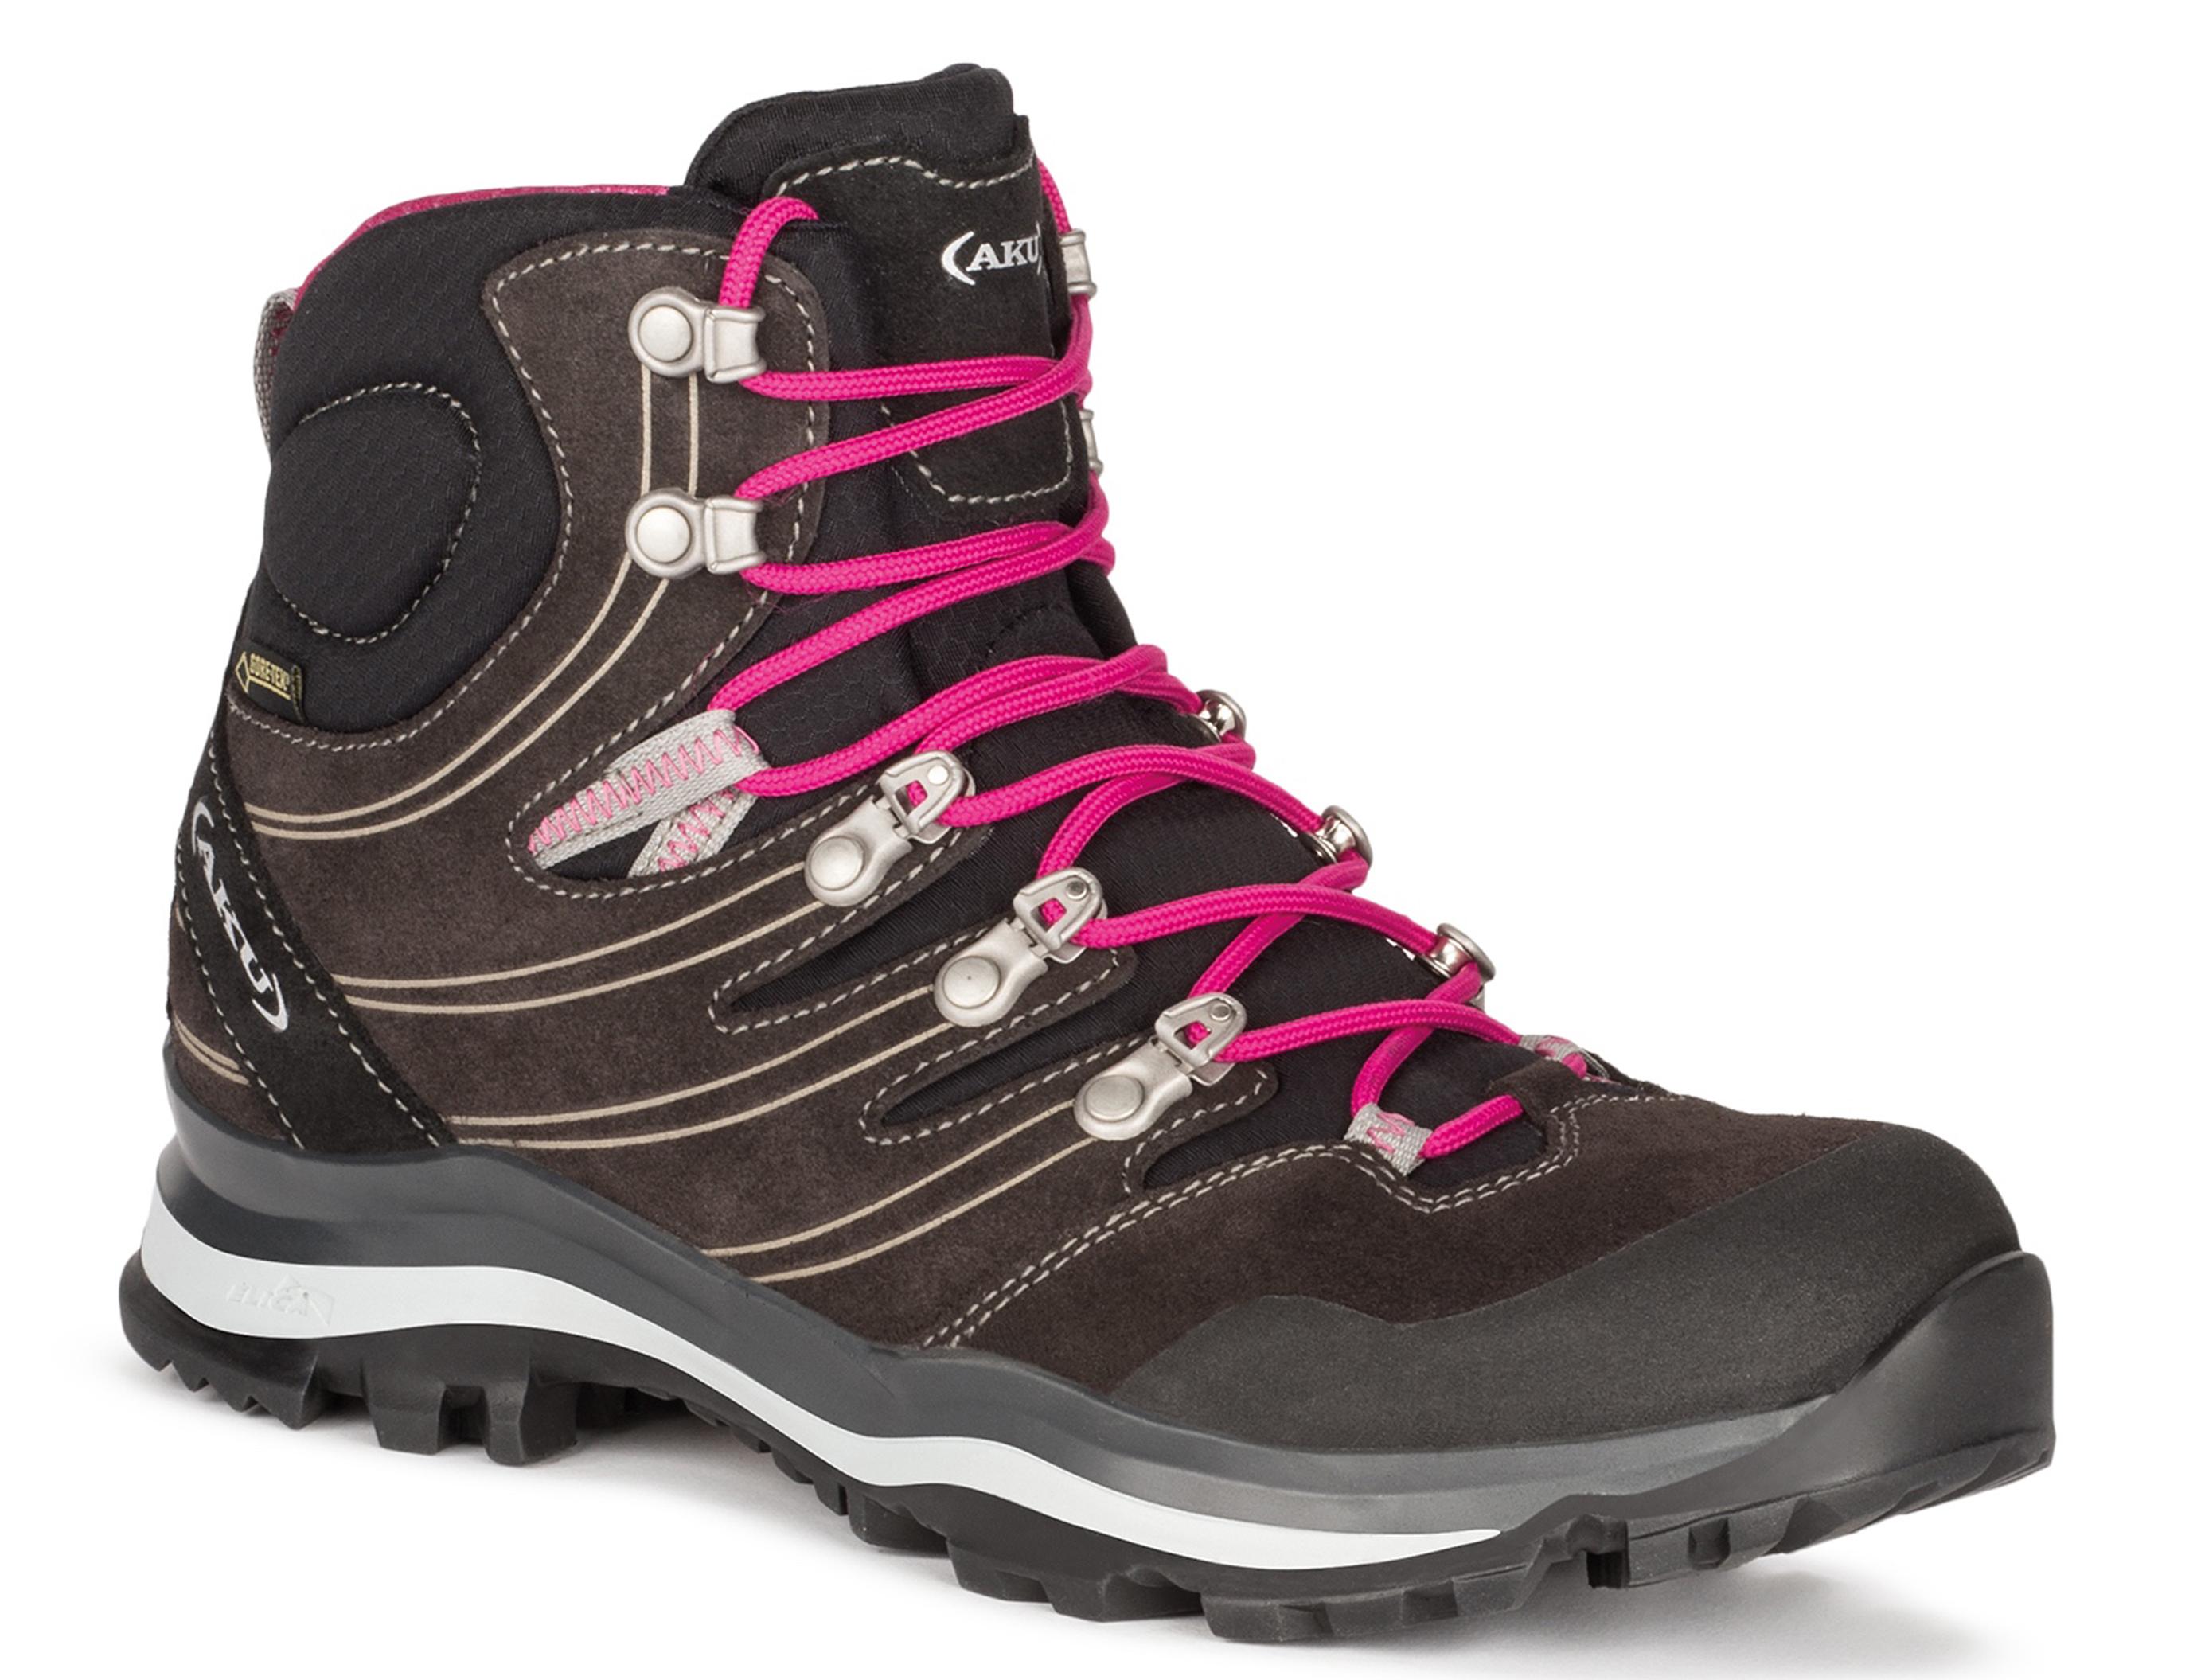 AKU Alterra Mid GTX women's walking boot (Aku/PA)